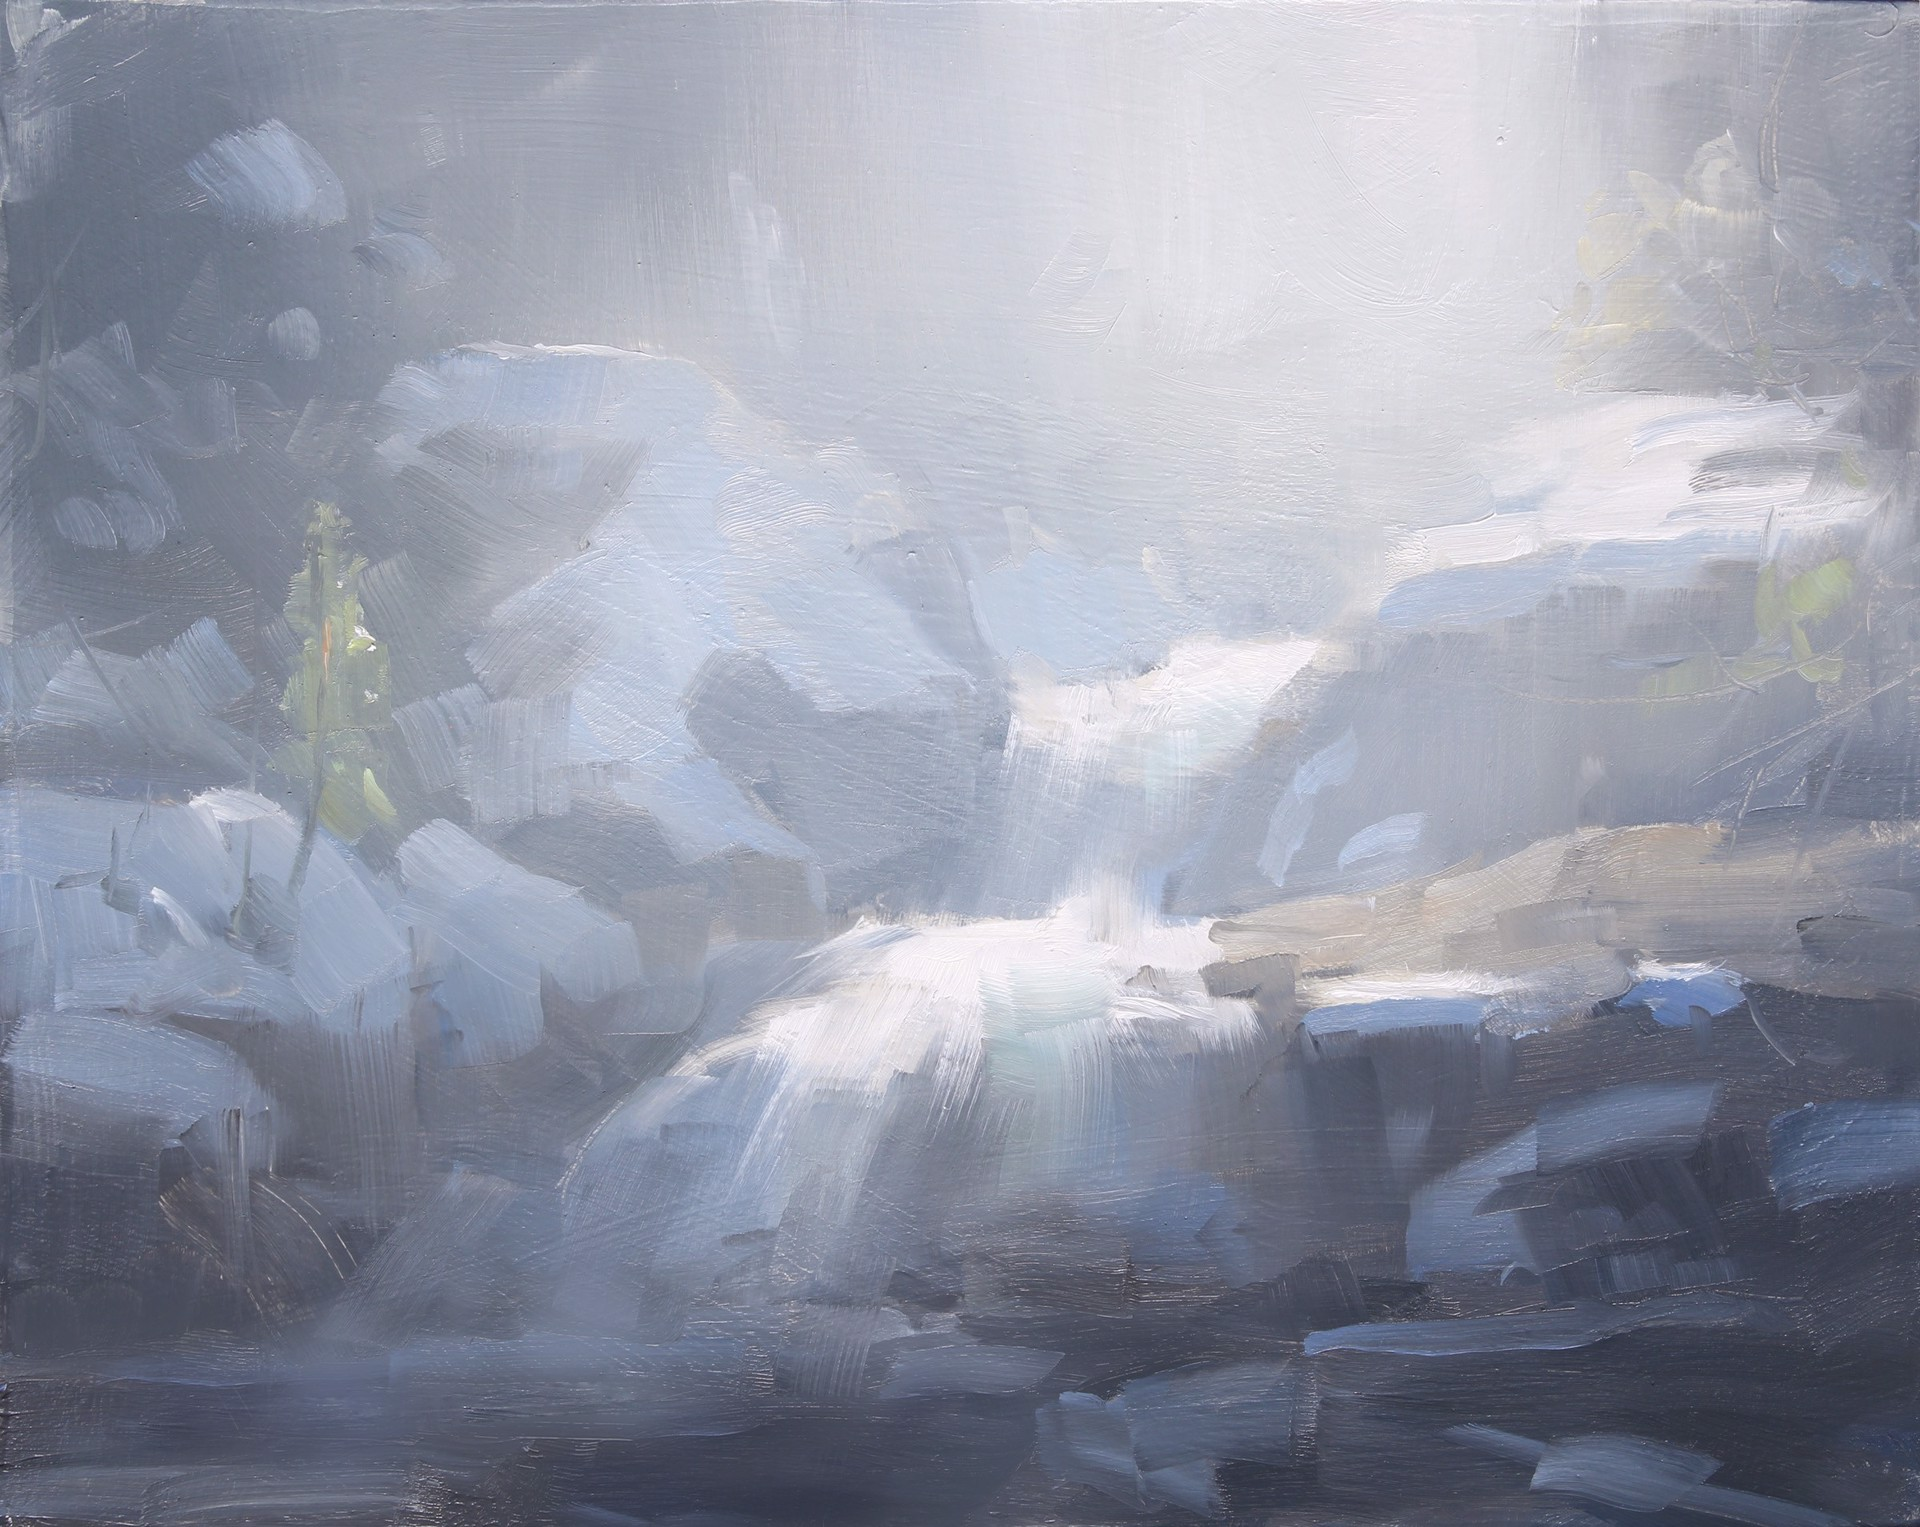 Snow on Copeland Falls Study by Dave Santillanes